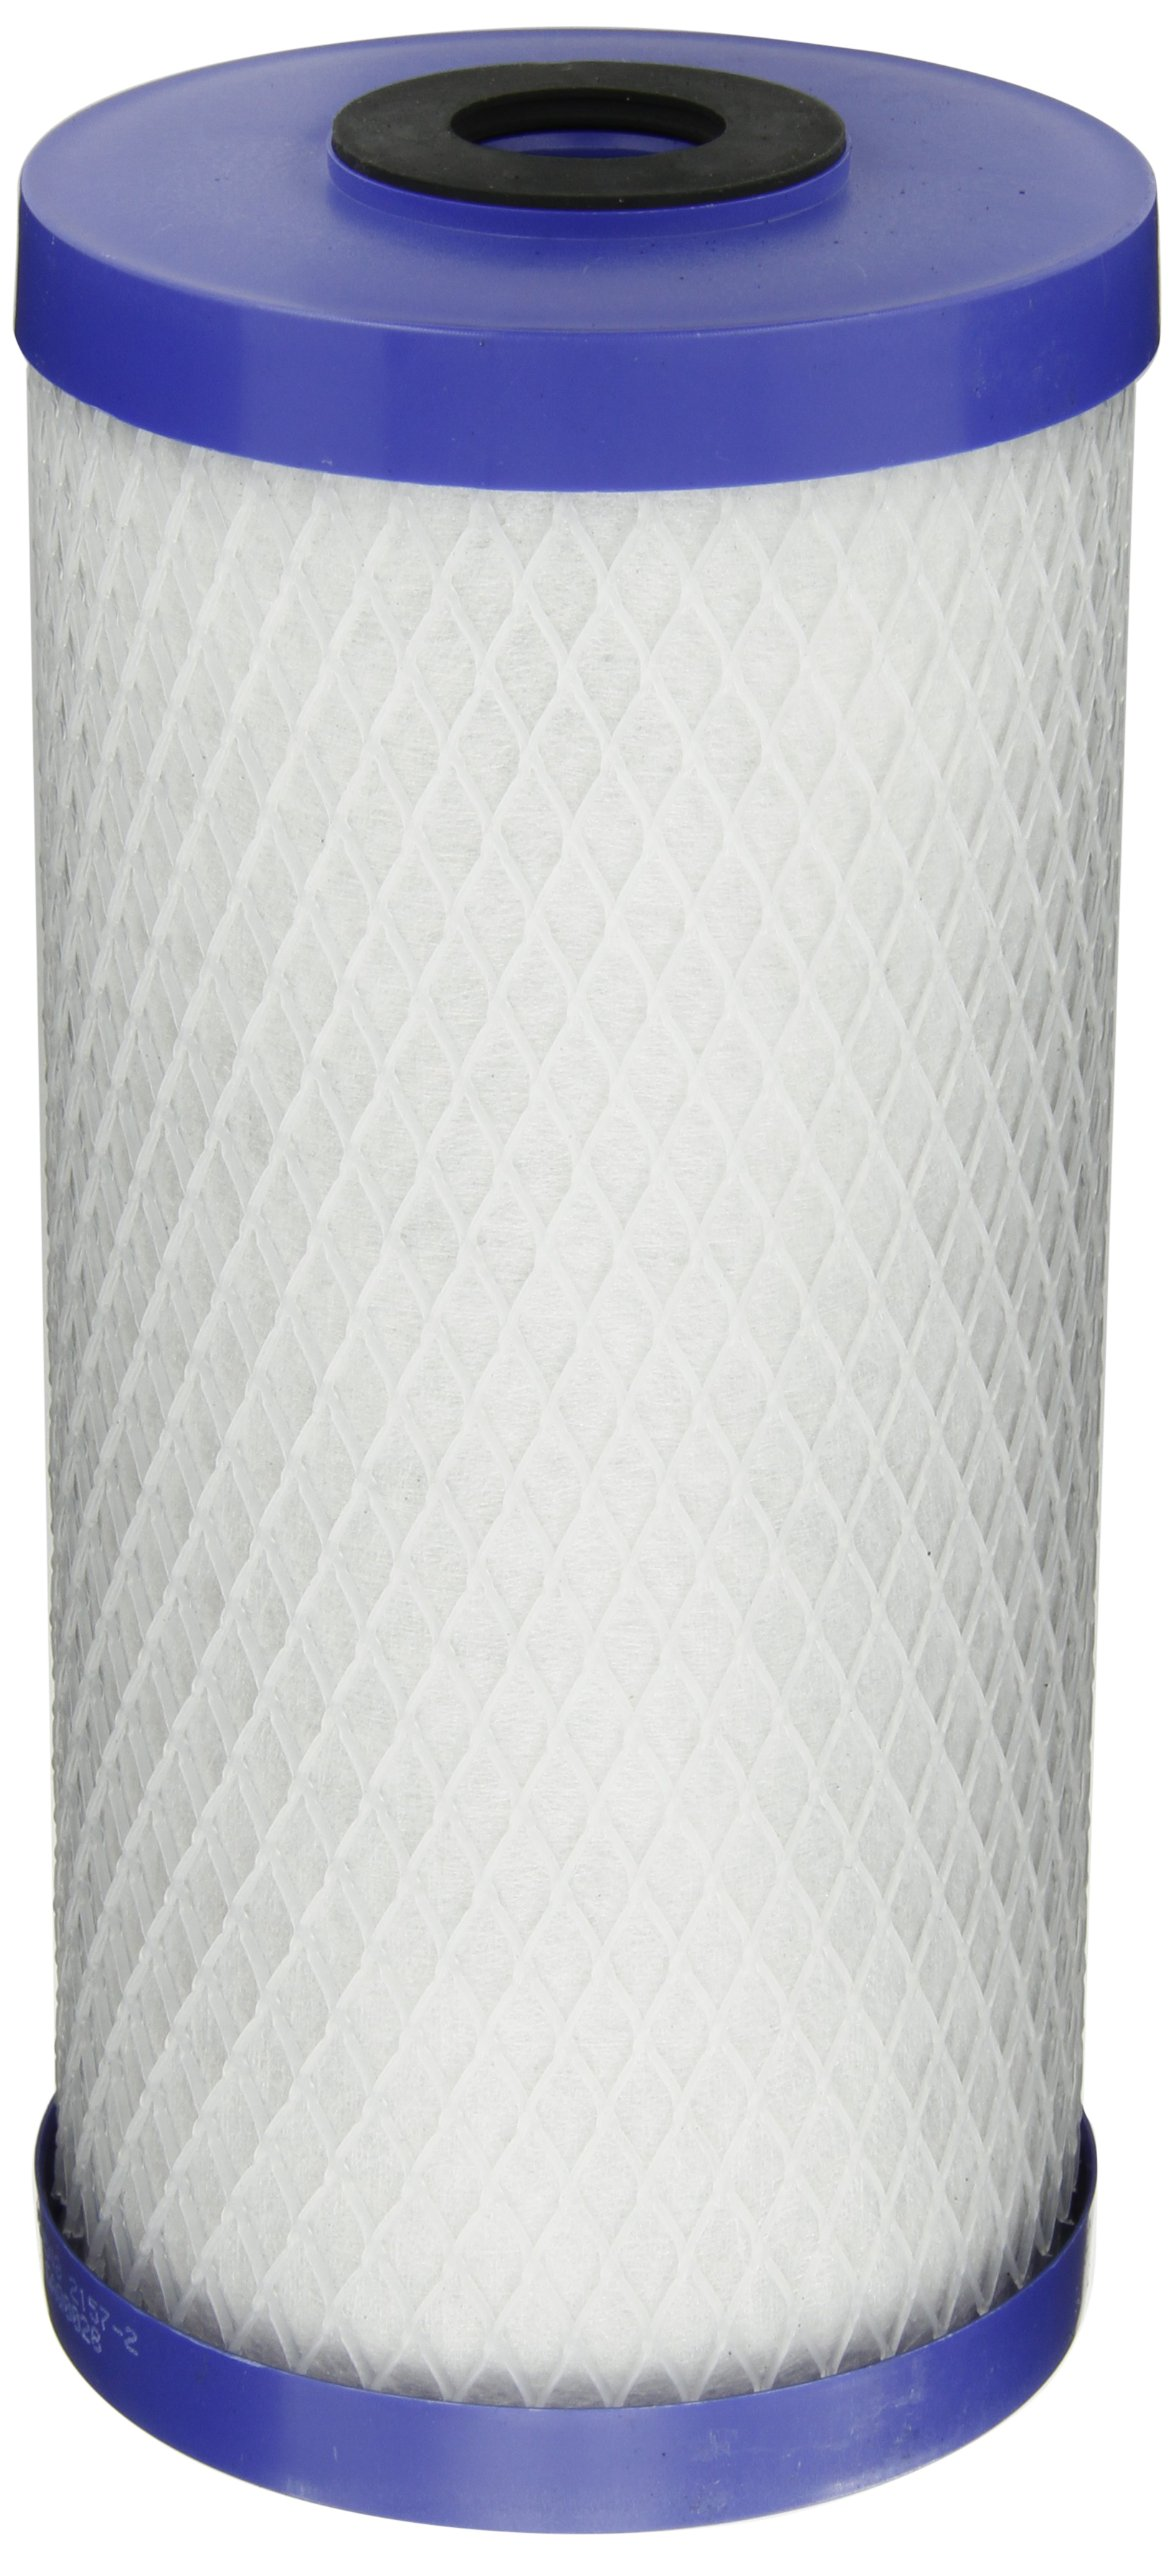 Pentek EP-BB Carbon Block Filter Cartridge, 9-3/4'' x 4-5/8'', 5 Microns by Pentek